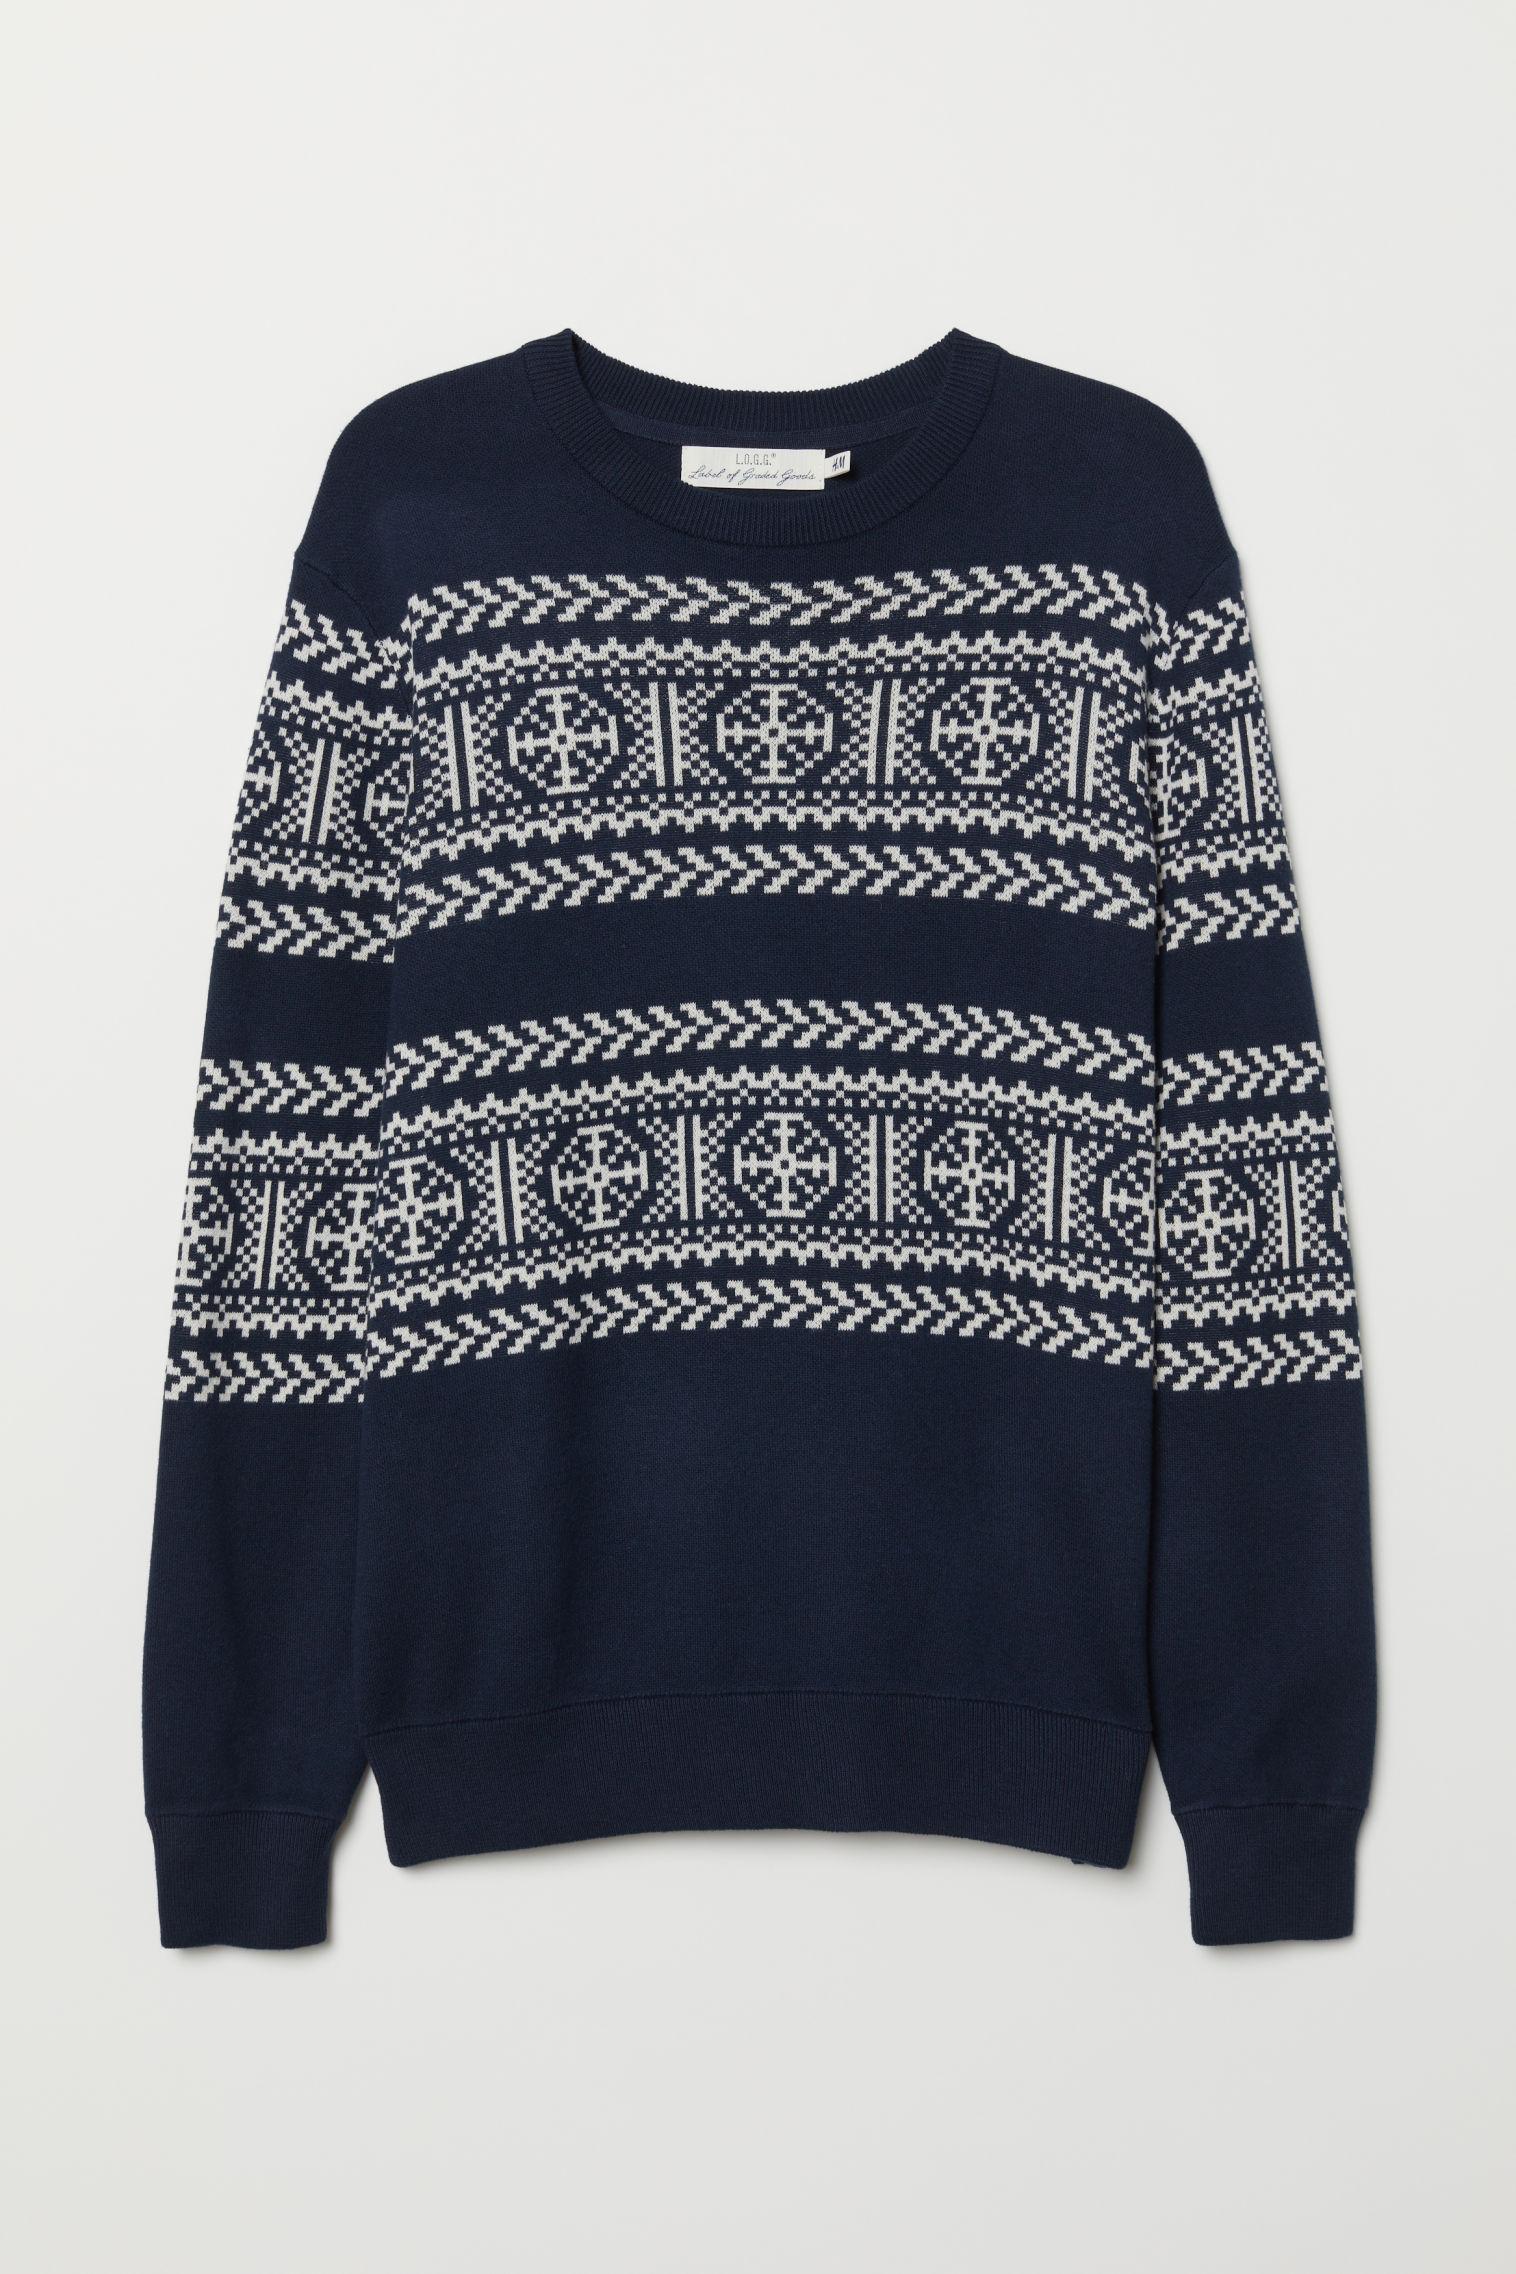 539a8e31a Jacquard-knit jumper